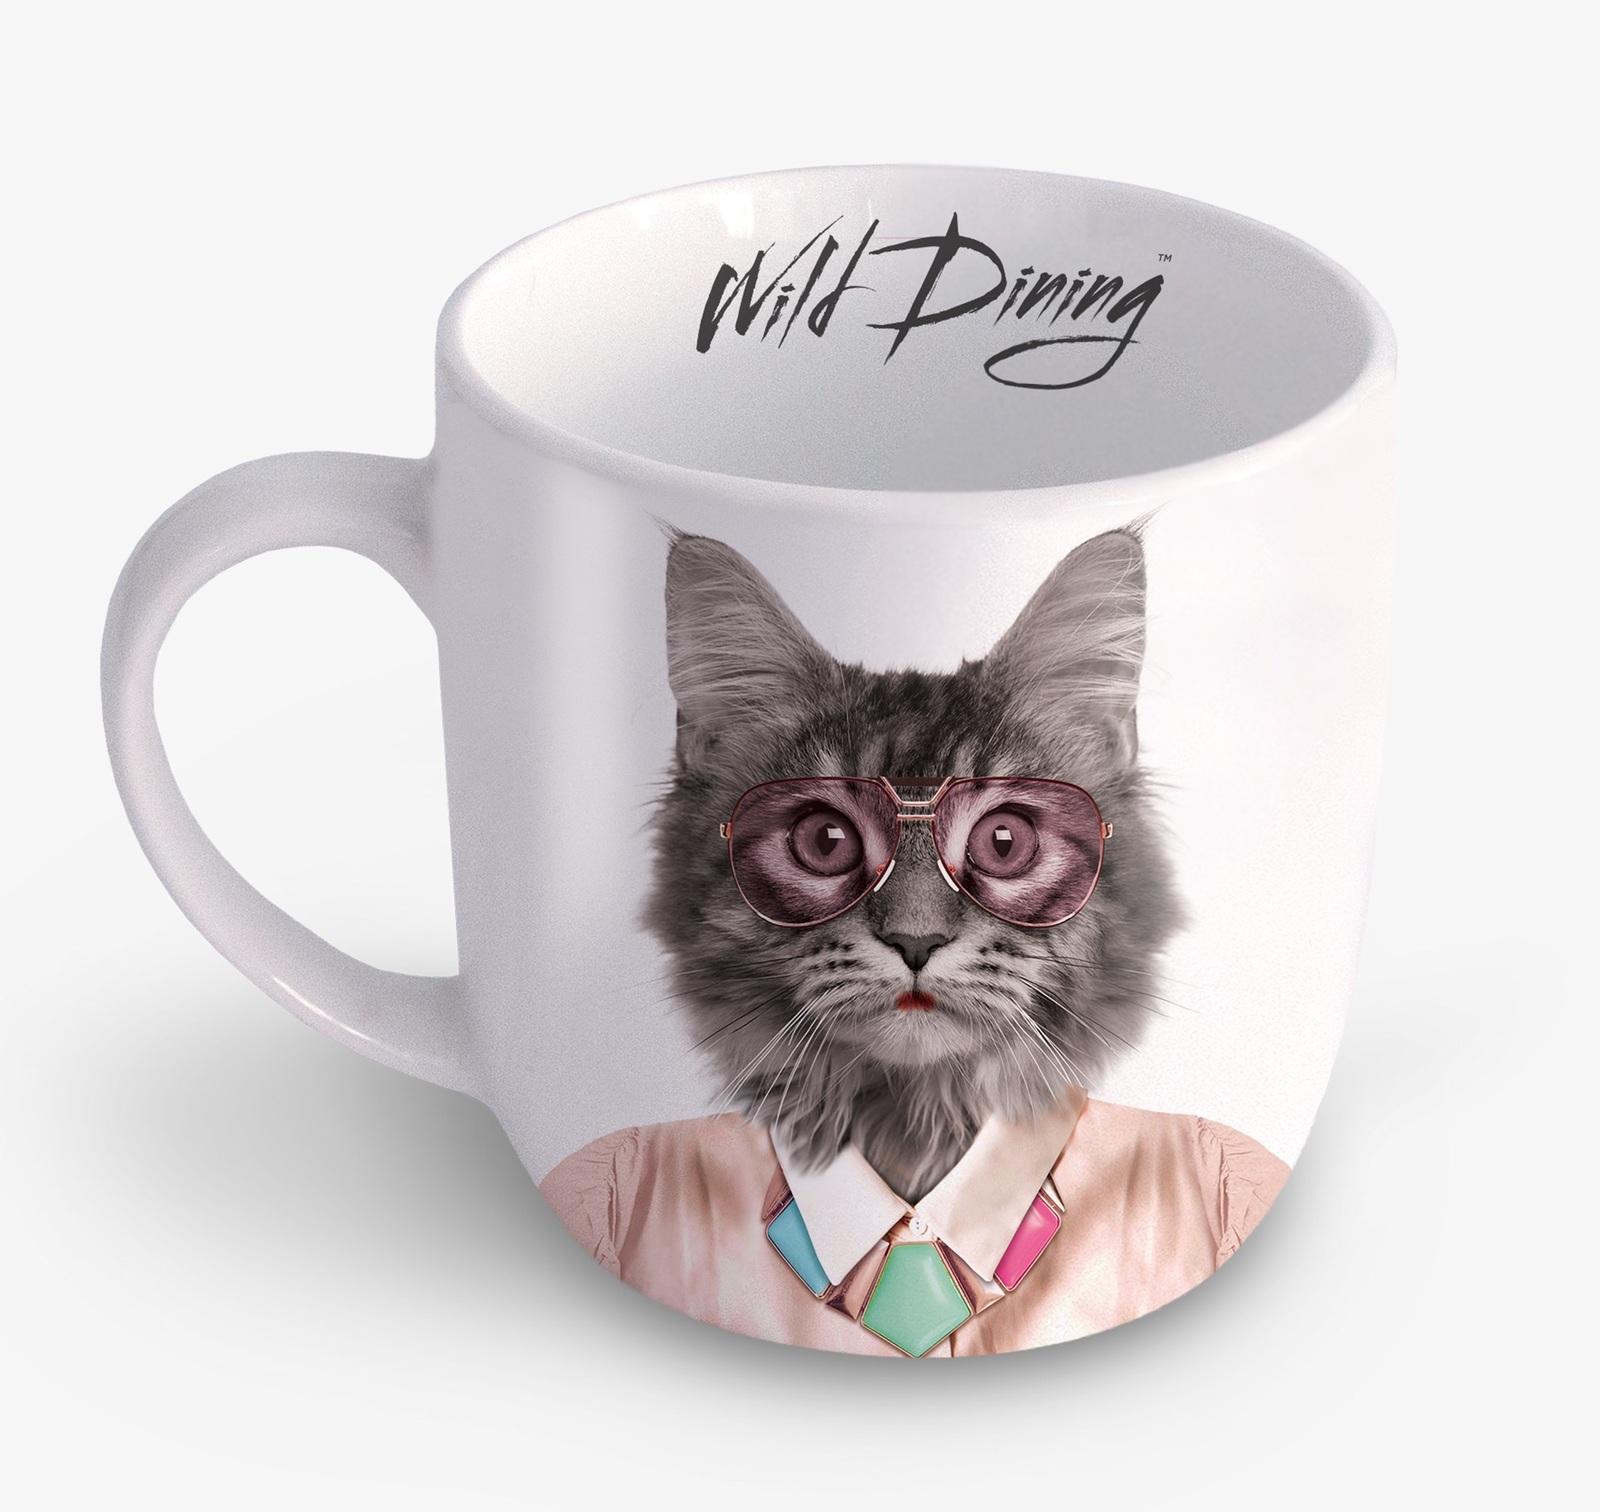 Wild Dining: Ceramic Mug - Cat image